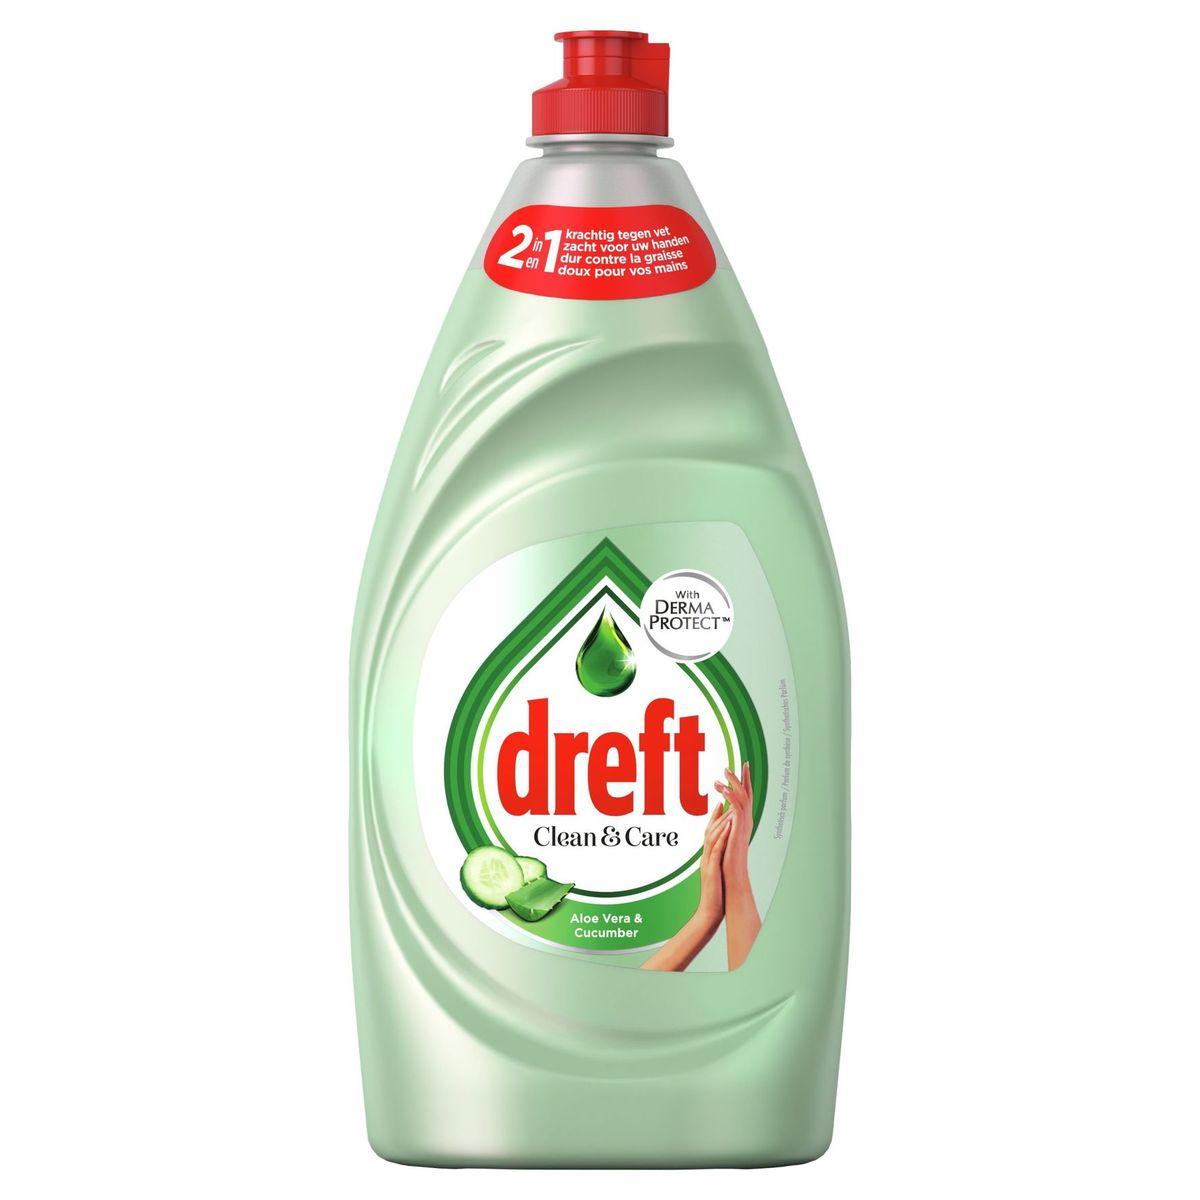 Dreft Clean & Care Afwasmiddel Aloe Vera & Cucumber 780 ml